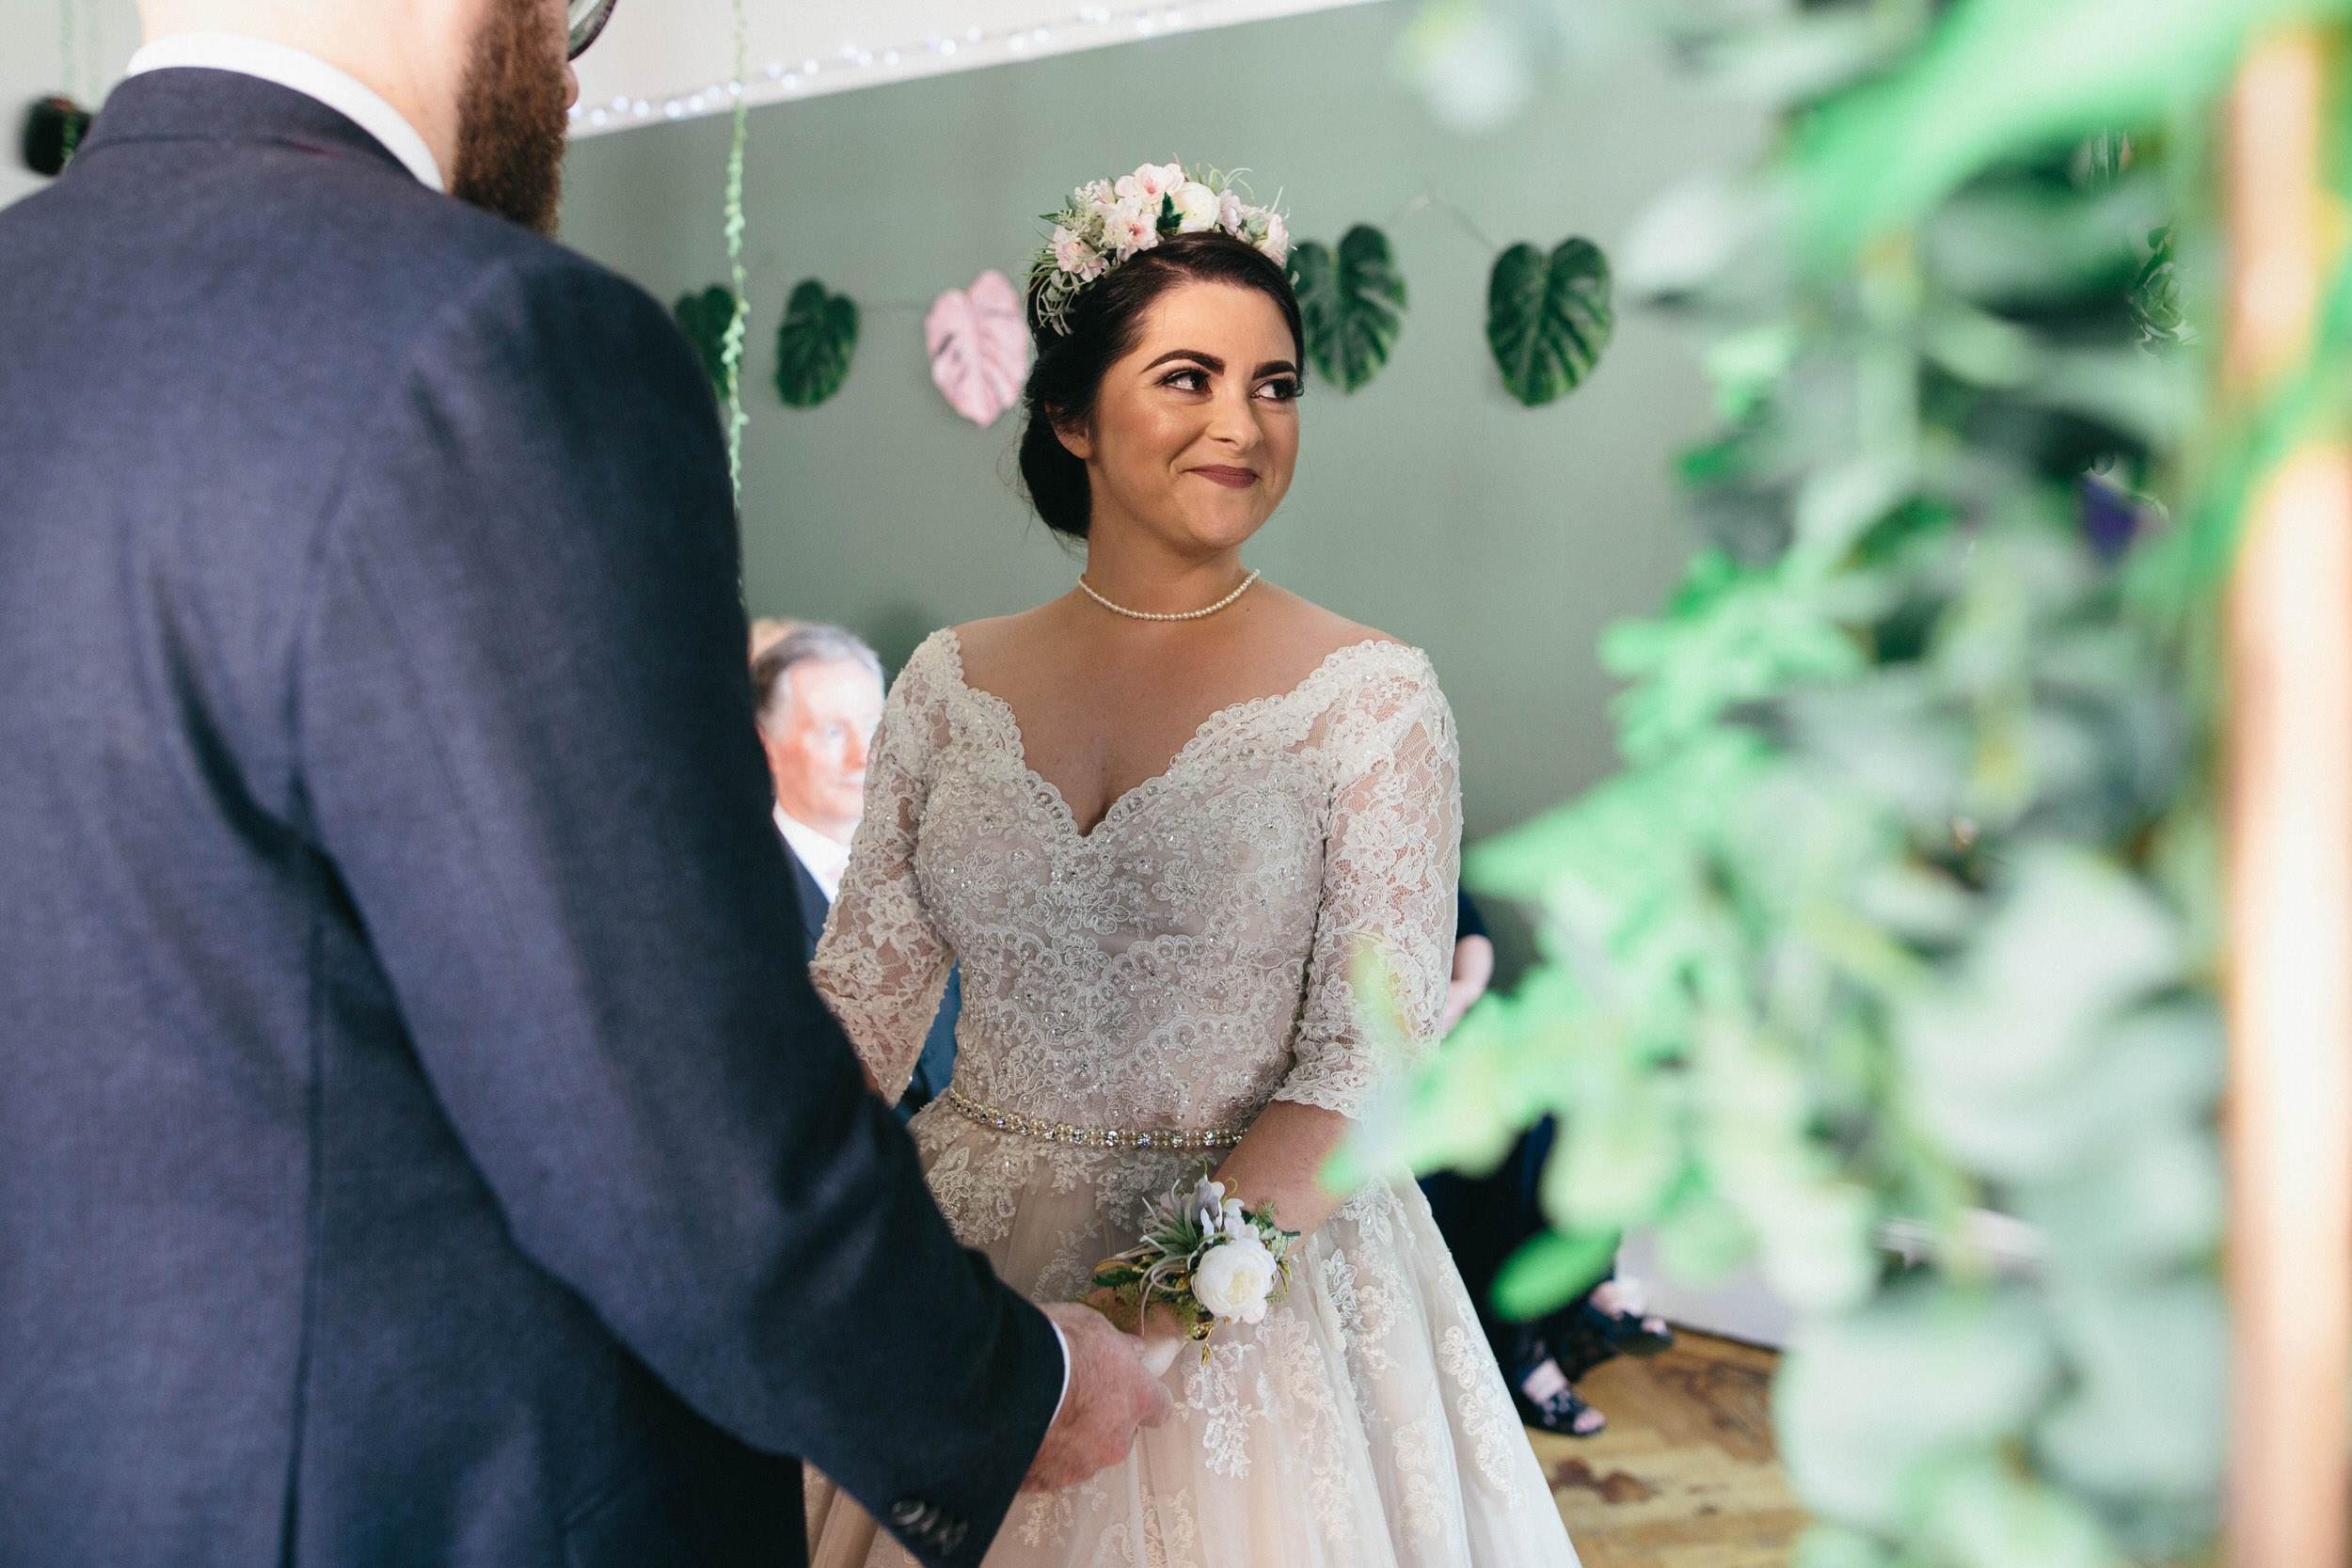 Quirky Wedding Photographer Scotland Glasgow Edinburgh Mirrorbox 063.jpg